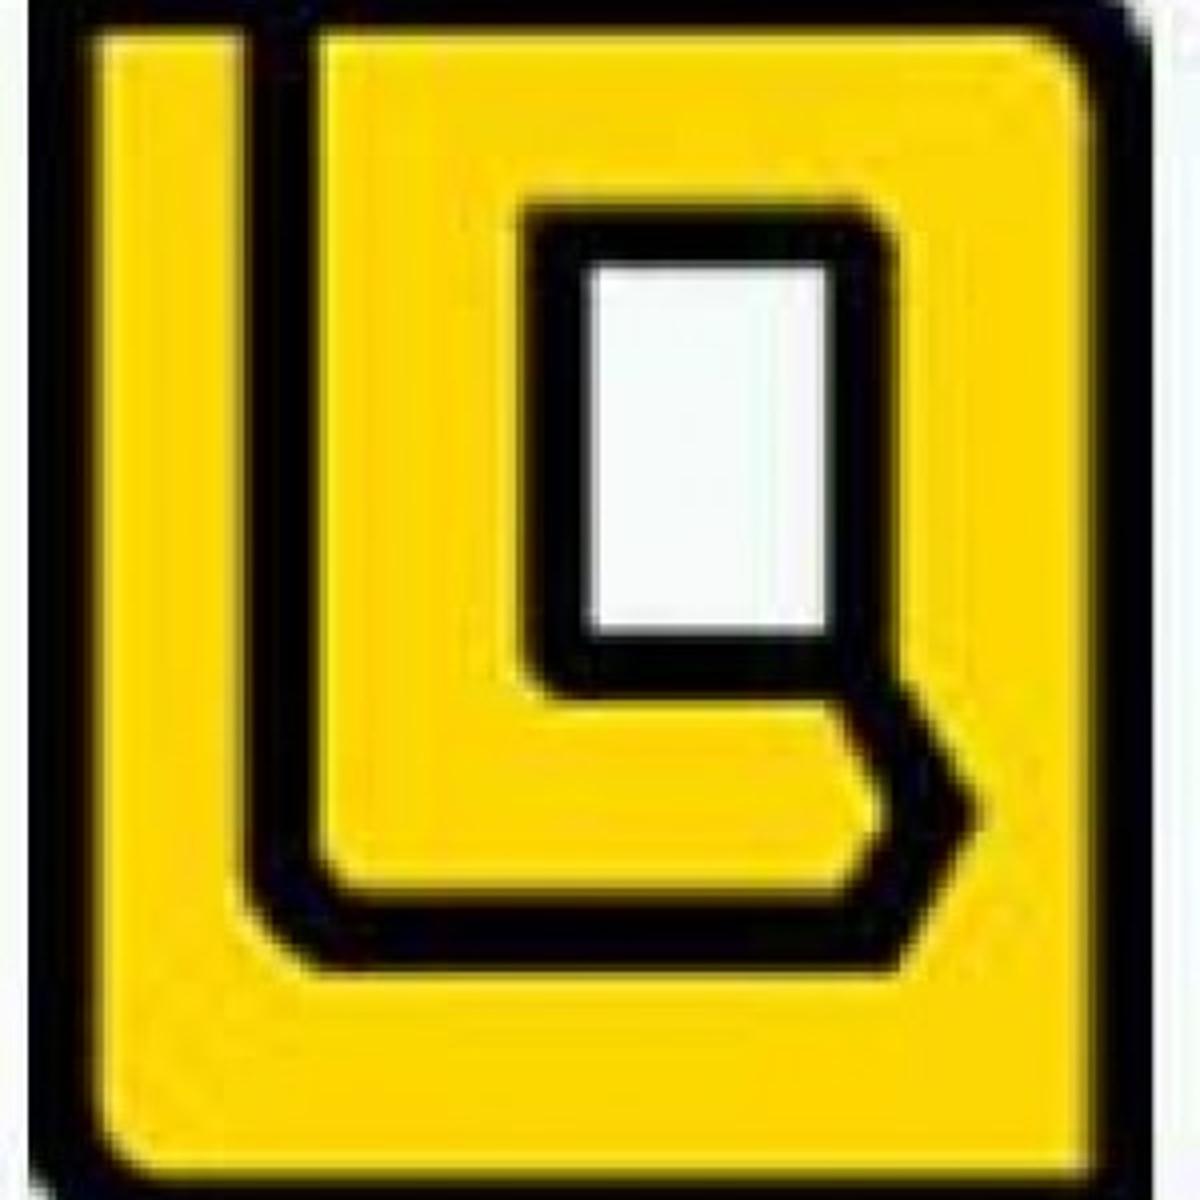 Taxi Jingle Available As Ringtone 242 2000 Unioonnn Caa